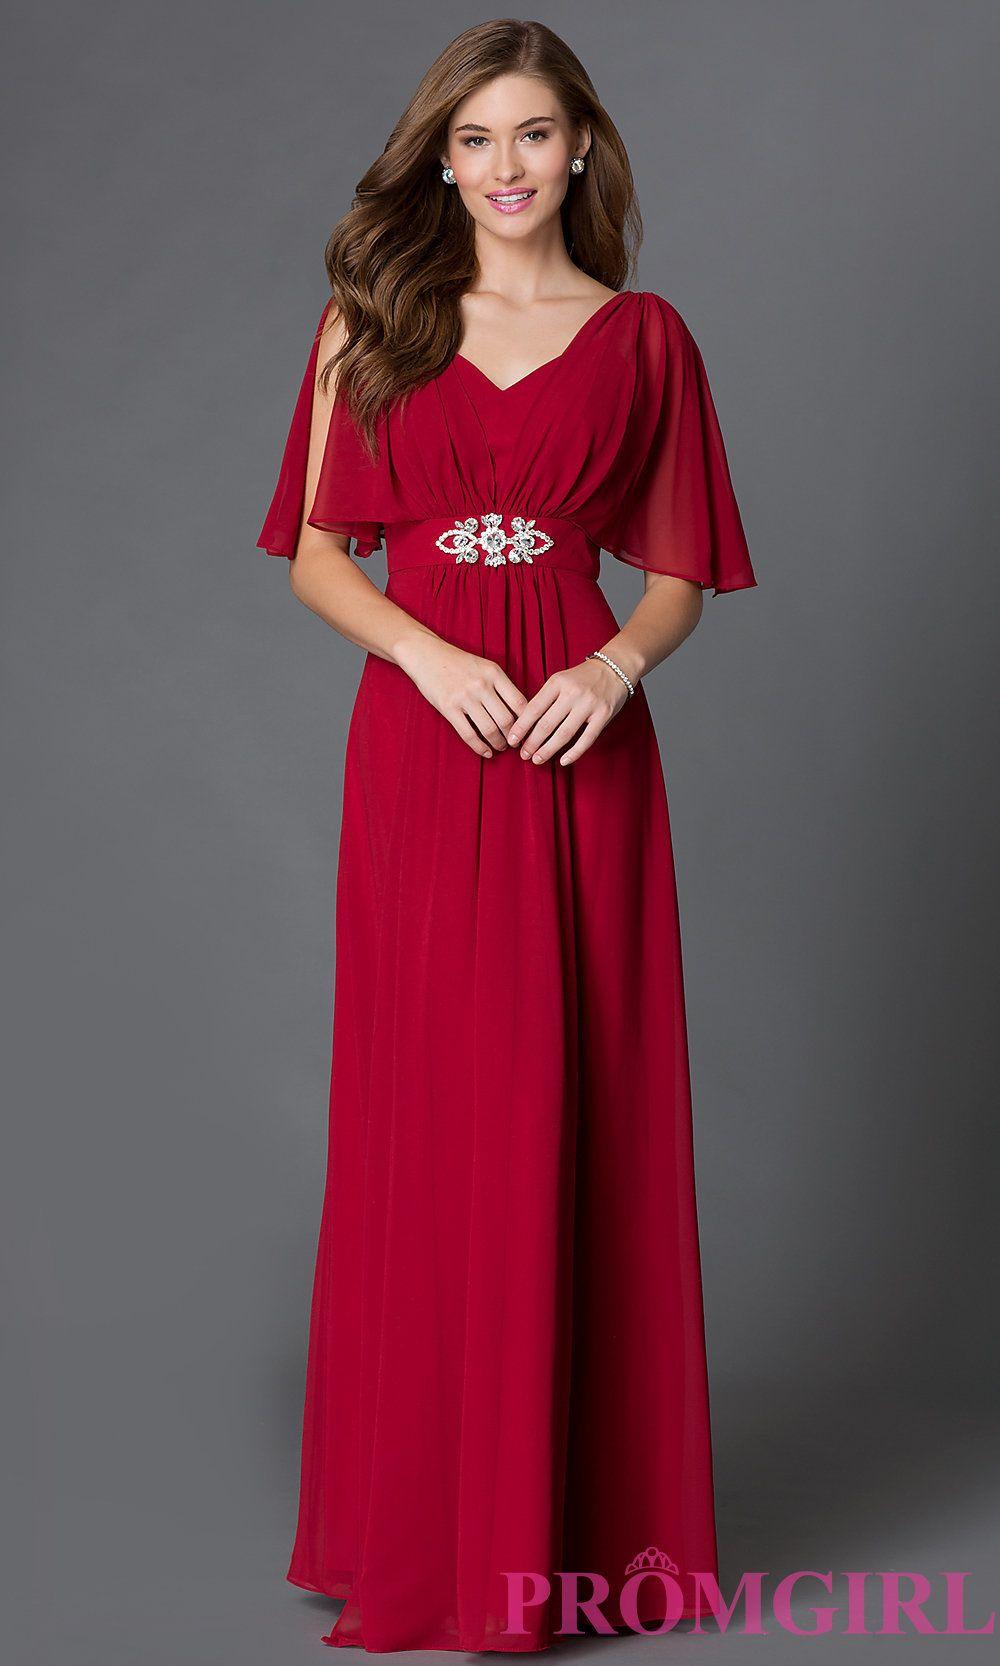 swatch_attribute_635395   Dress   Pinterest